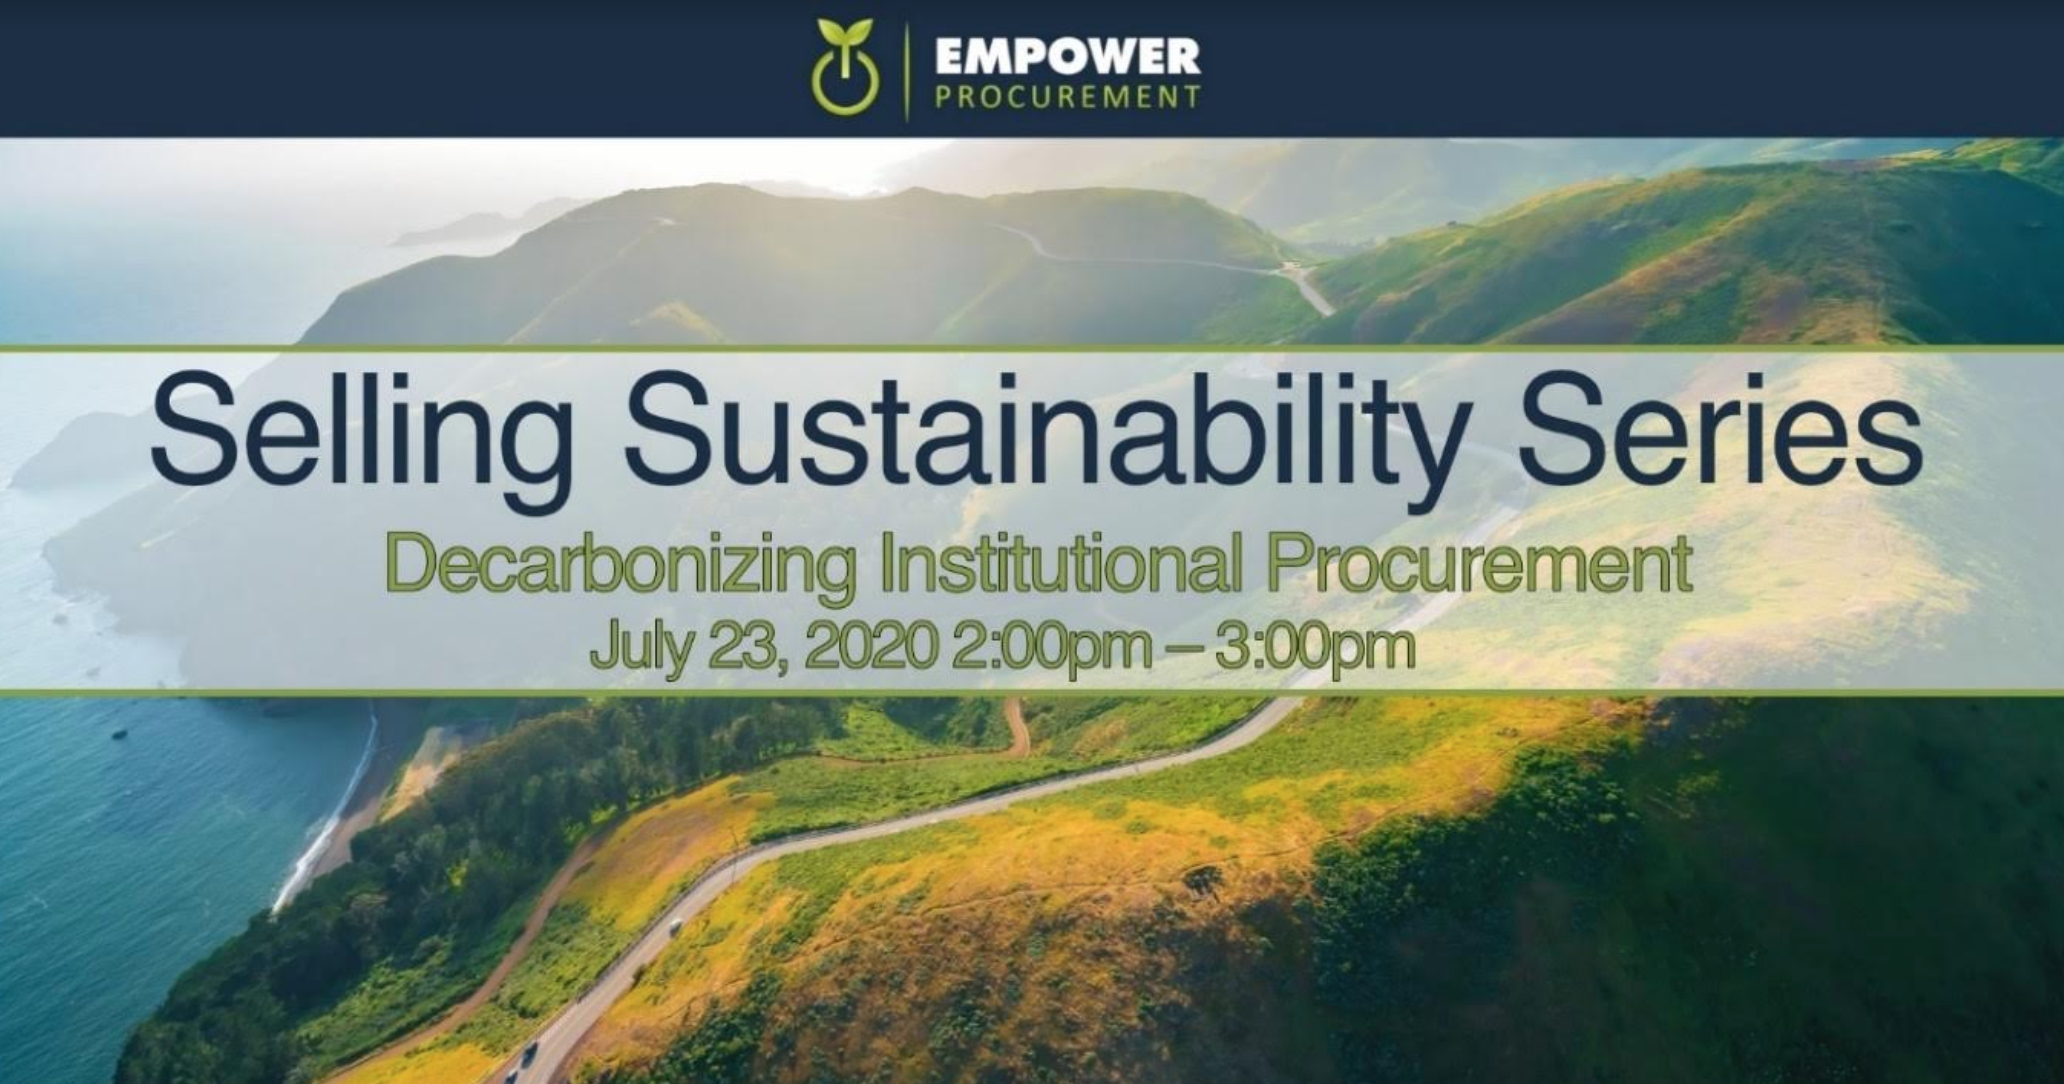 Empower Procurement + ecomedes: Working Towards an Efficient Future